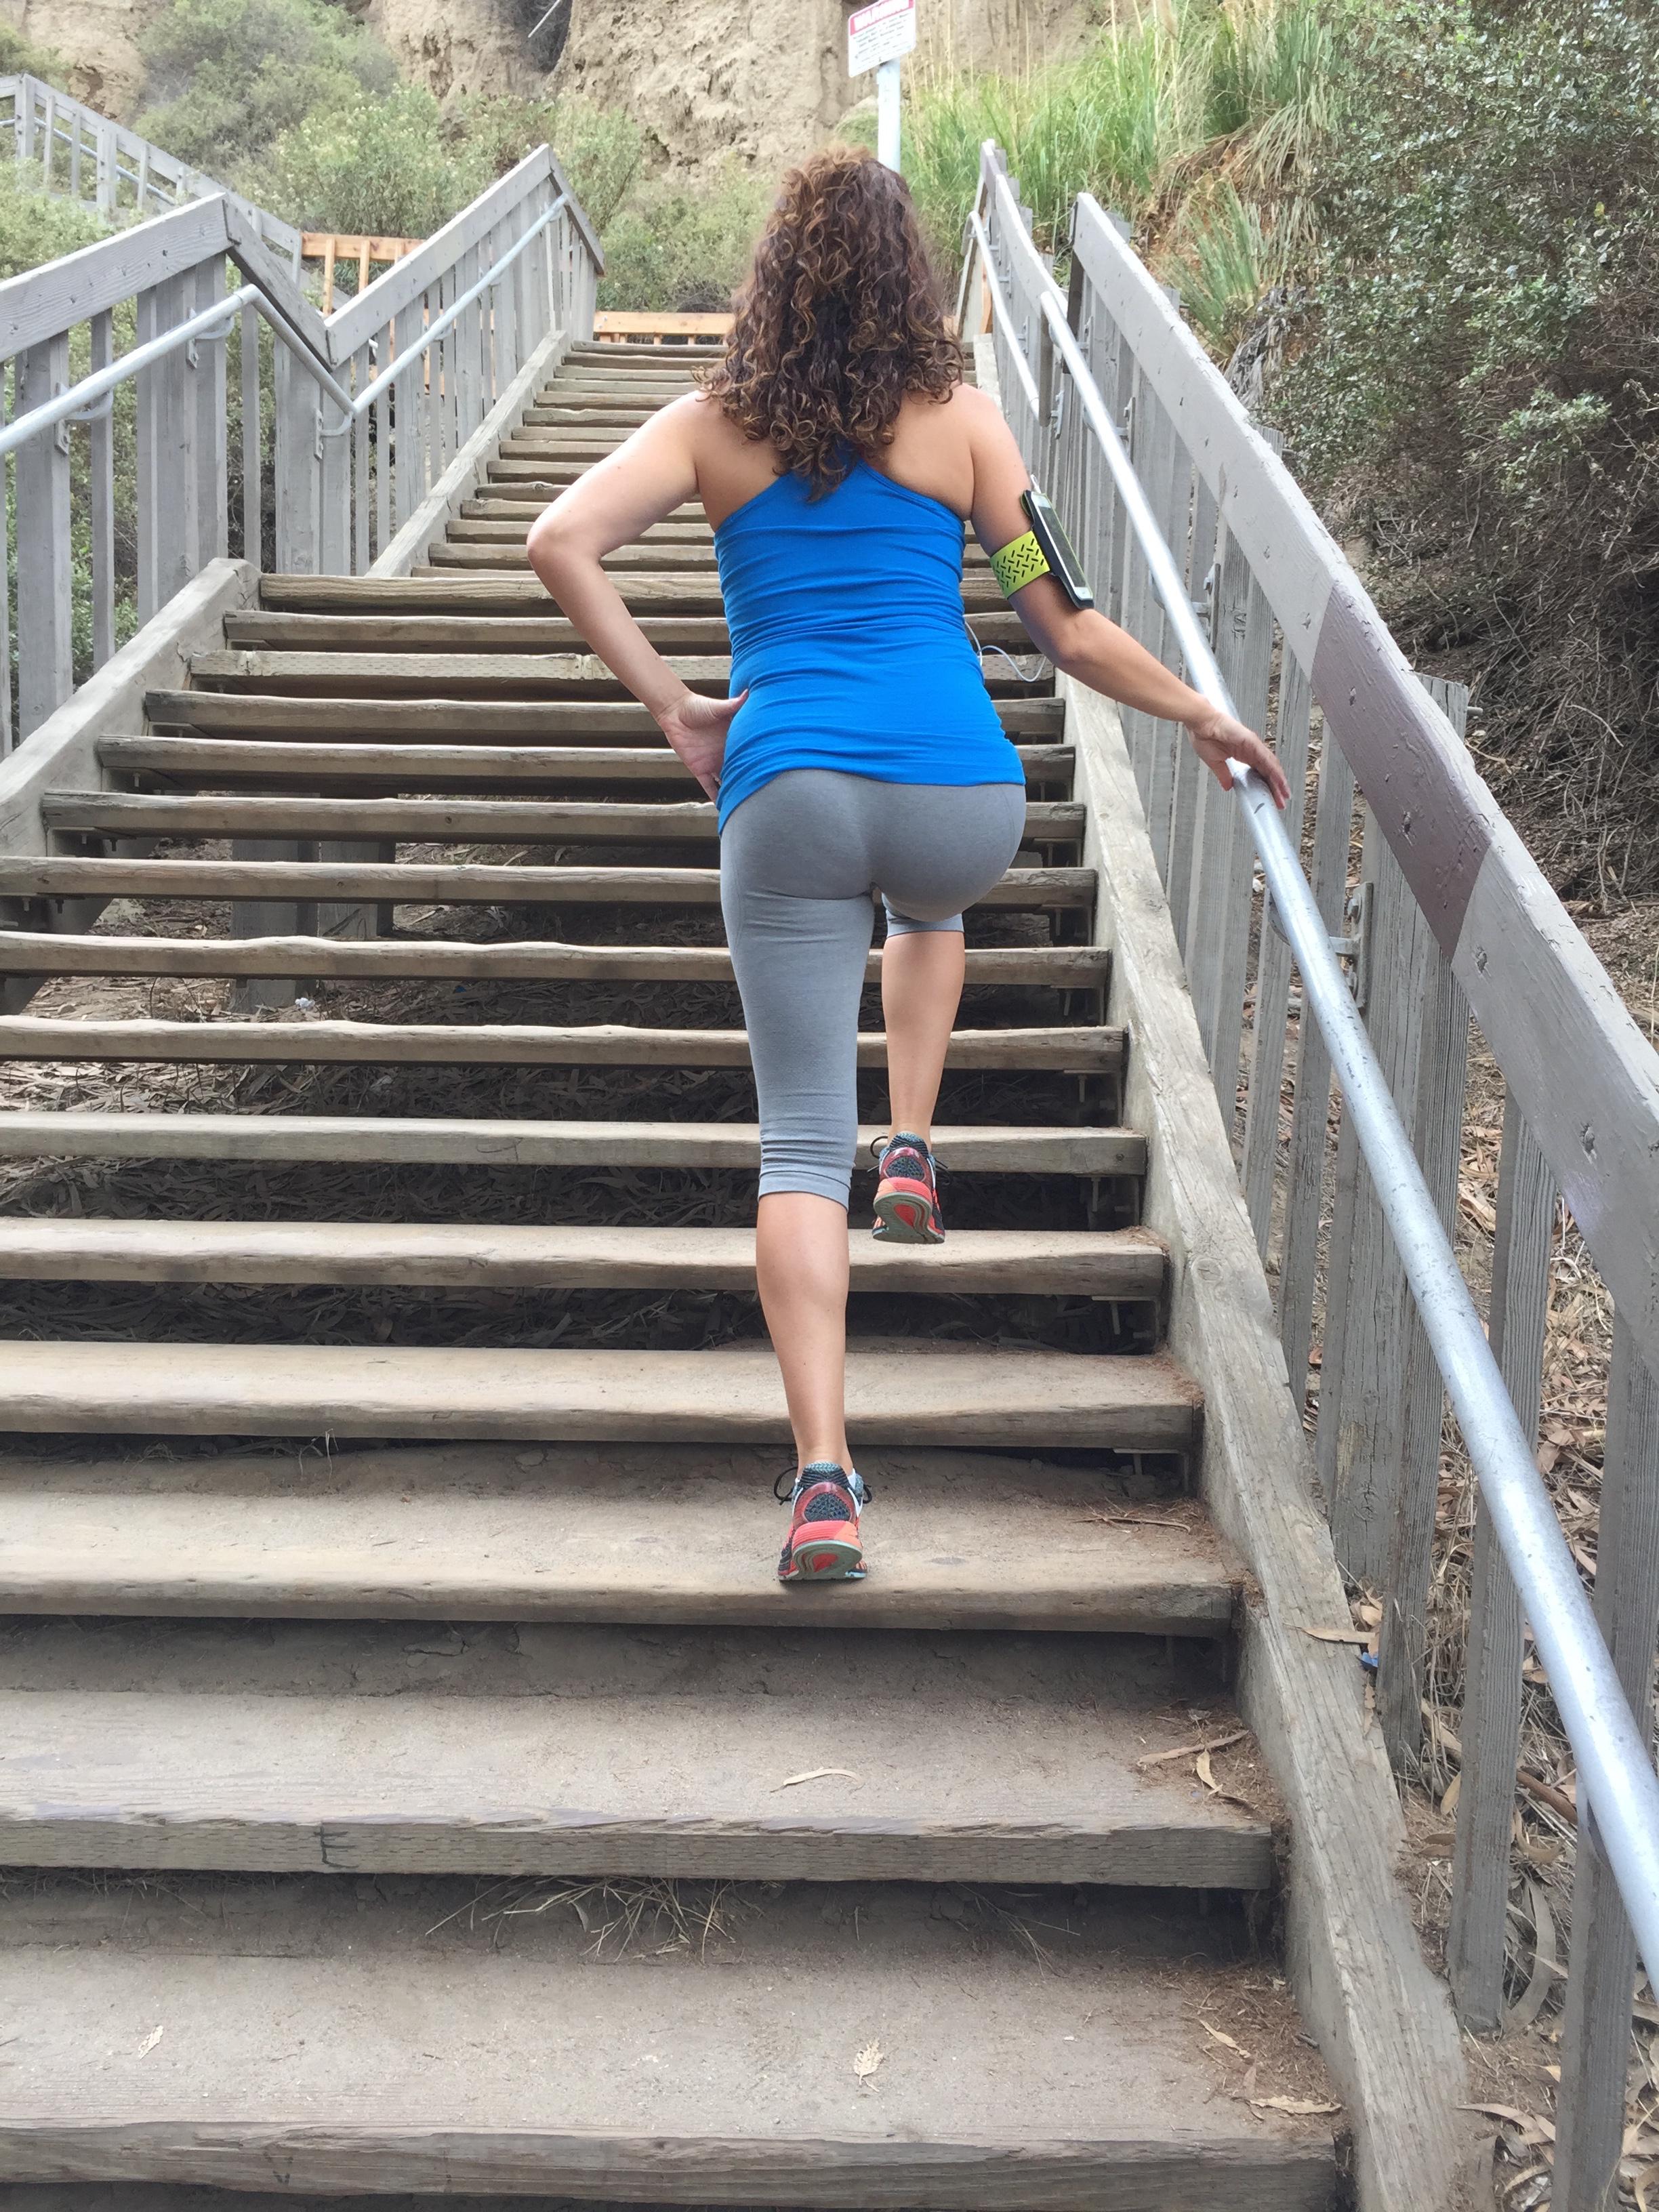 Stair Climbing, Cardio, Stepper, Stair Workout